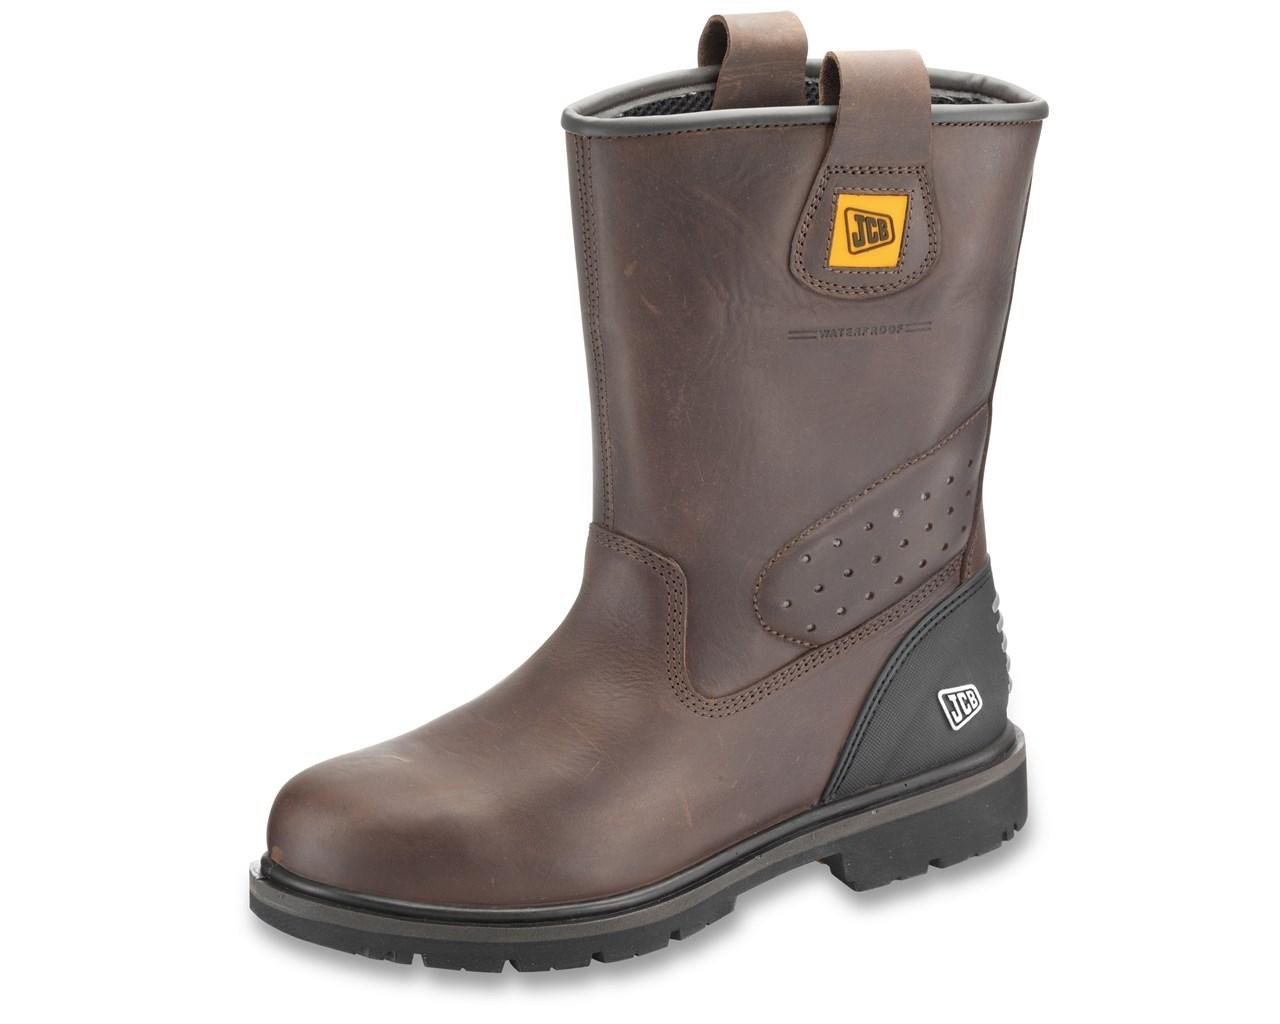 jcb trackpro safety rigger boots in black jcb trackpro AHLJXDN